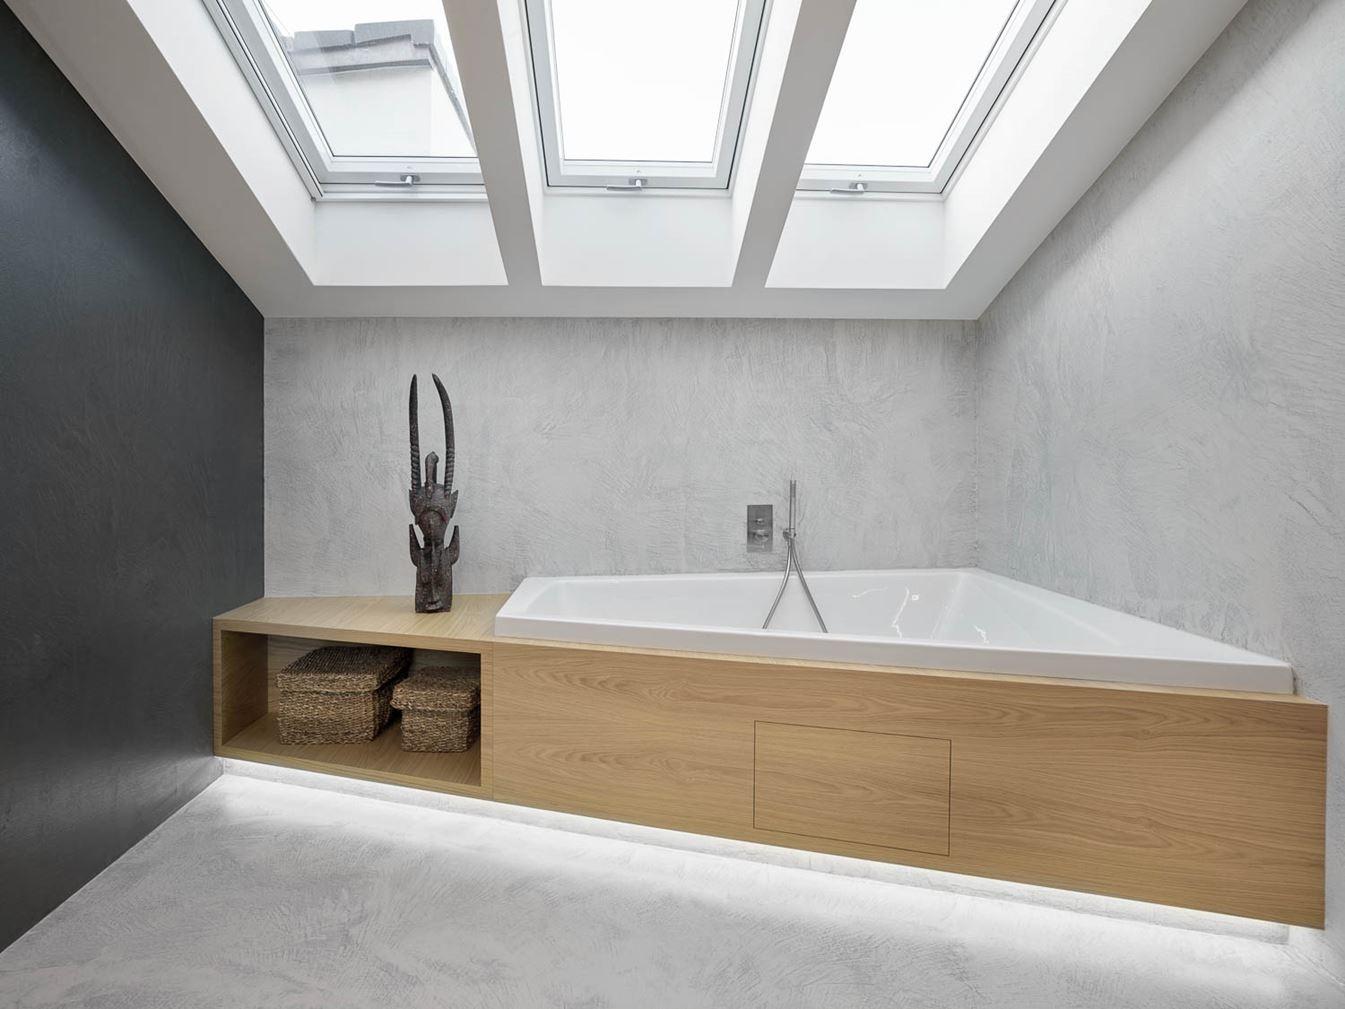 Una casa di lusso con bagno in mansarda mansarda.it